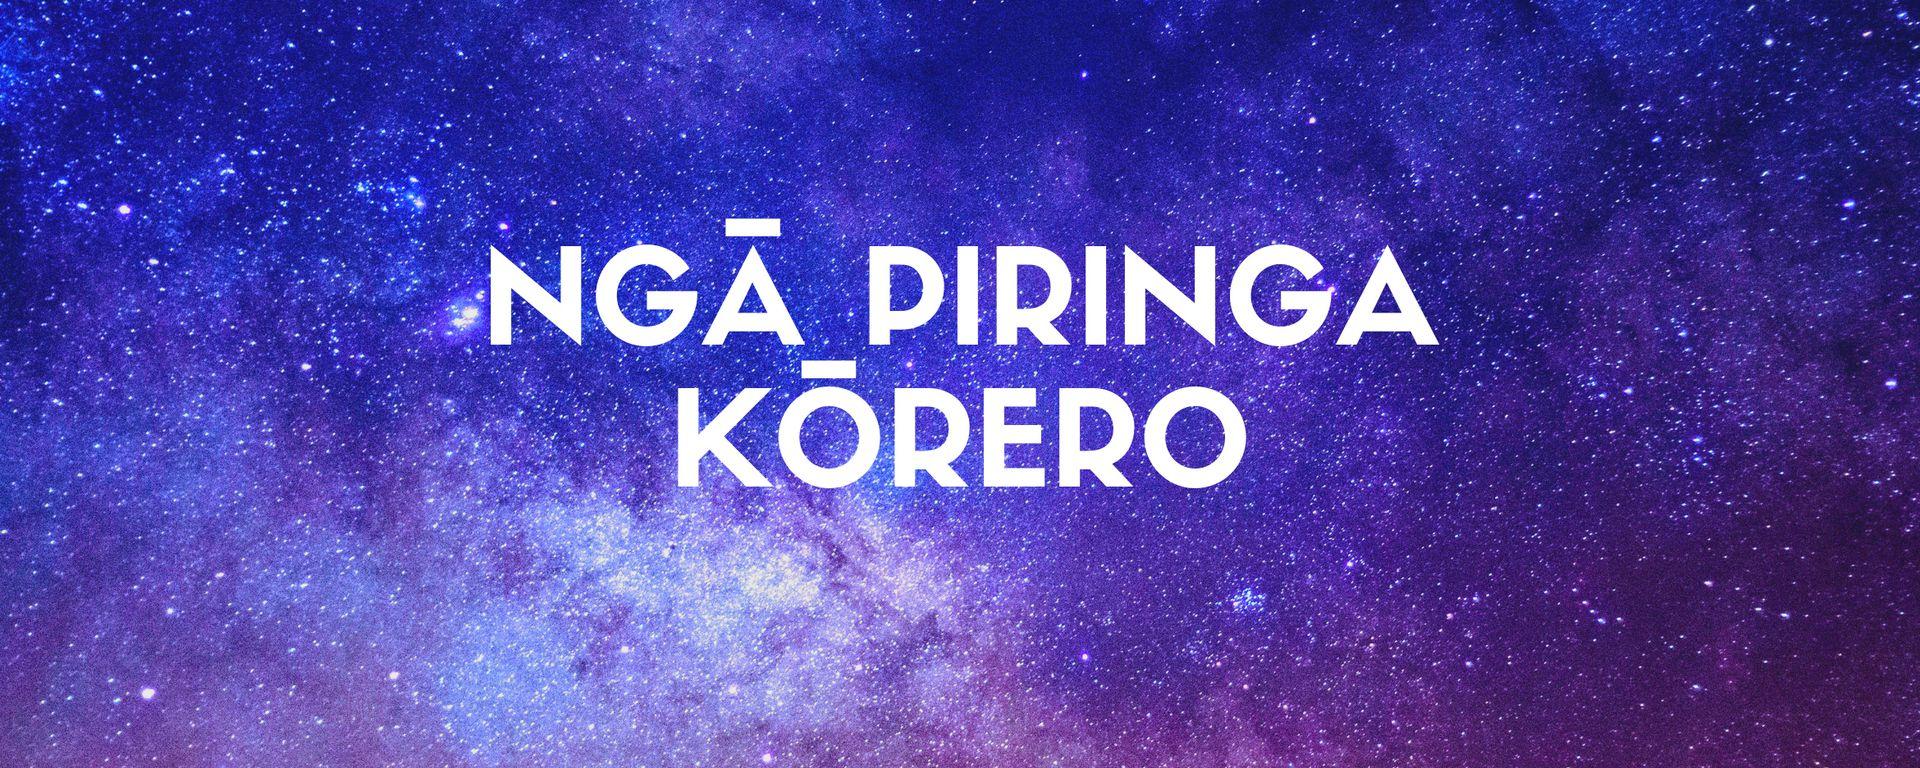 Ngā Piringa Kōrero